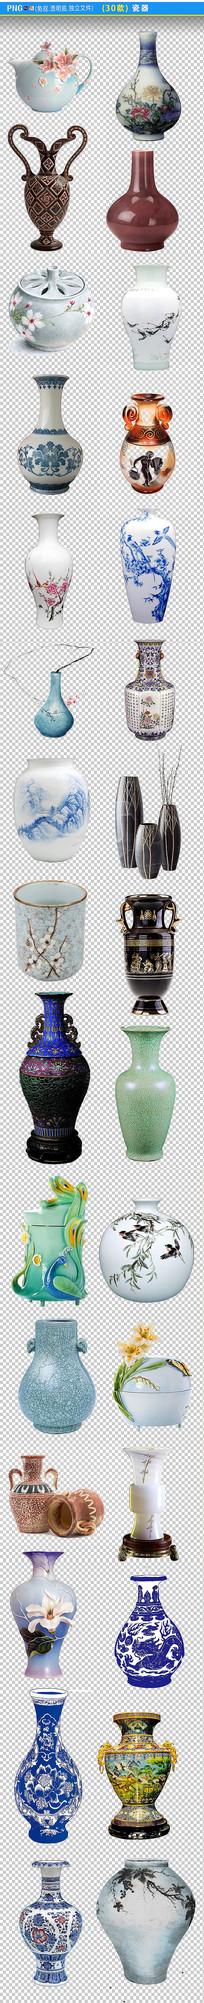 瓷器PNG素材